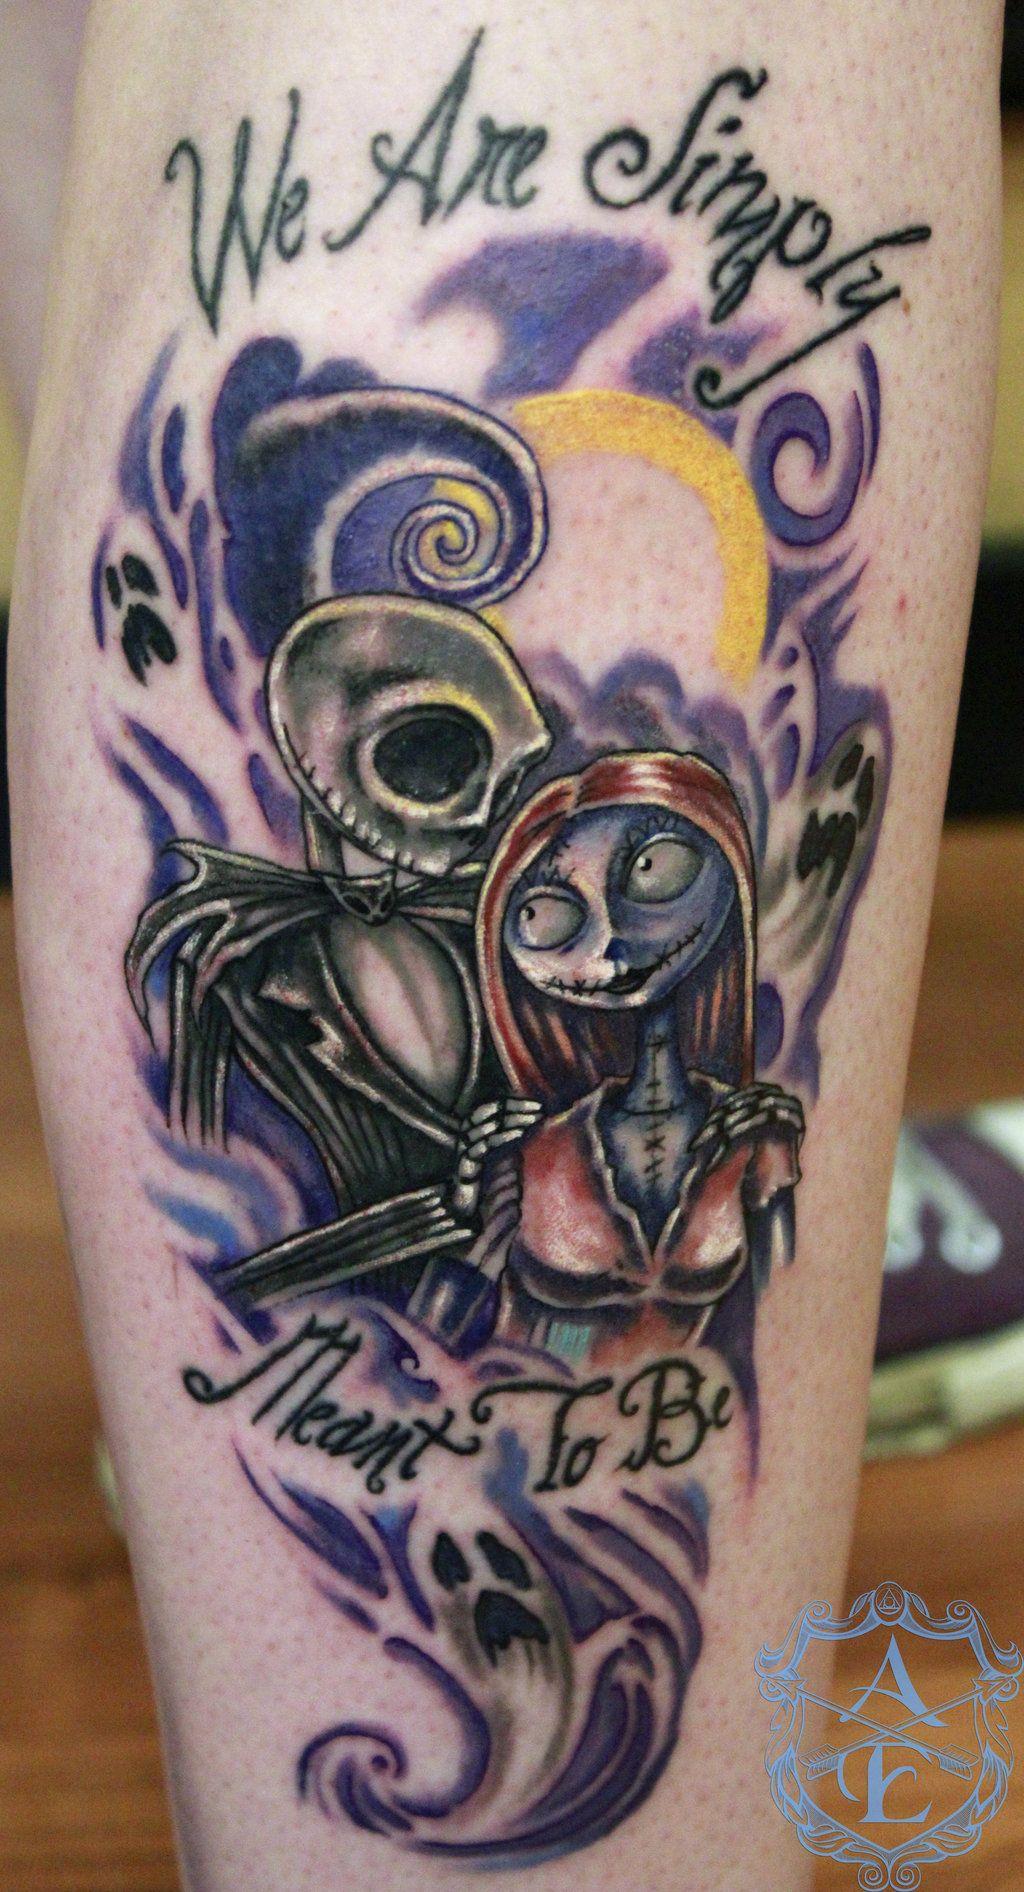 jack and sally tattoo - Google Search | Tatuaggi | Pinterest | Sally ...